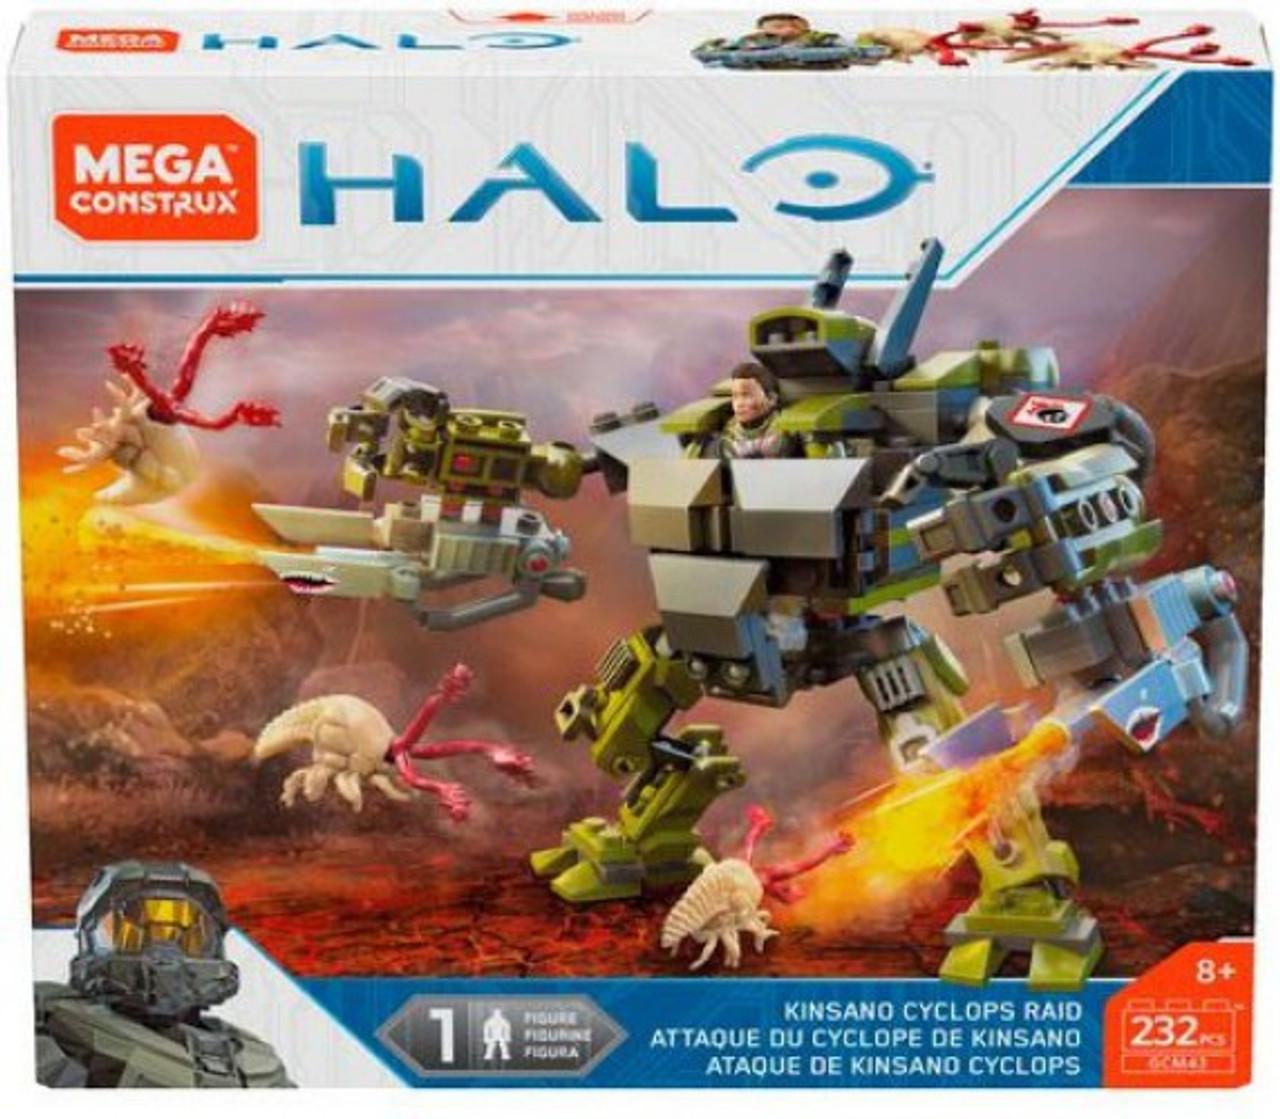 Halo Mega Construx Warzone Kinsano Cyclops Raid Set